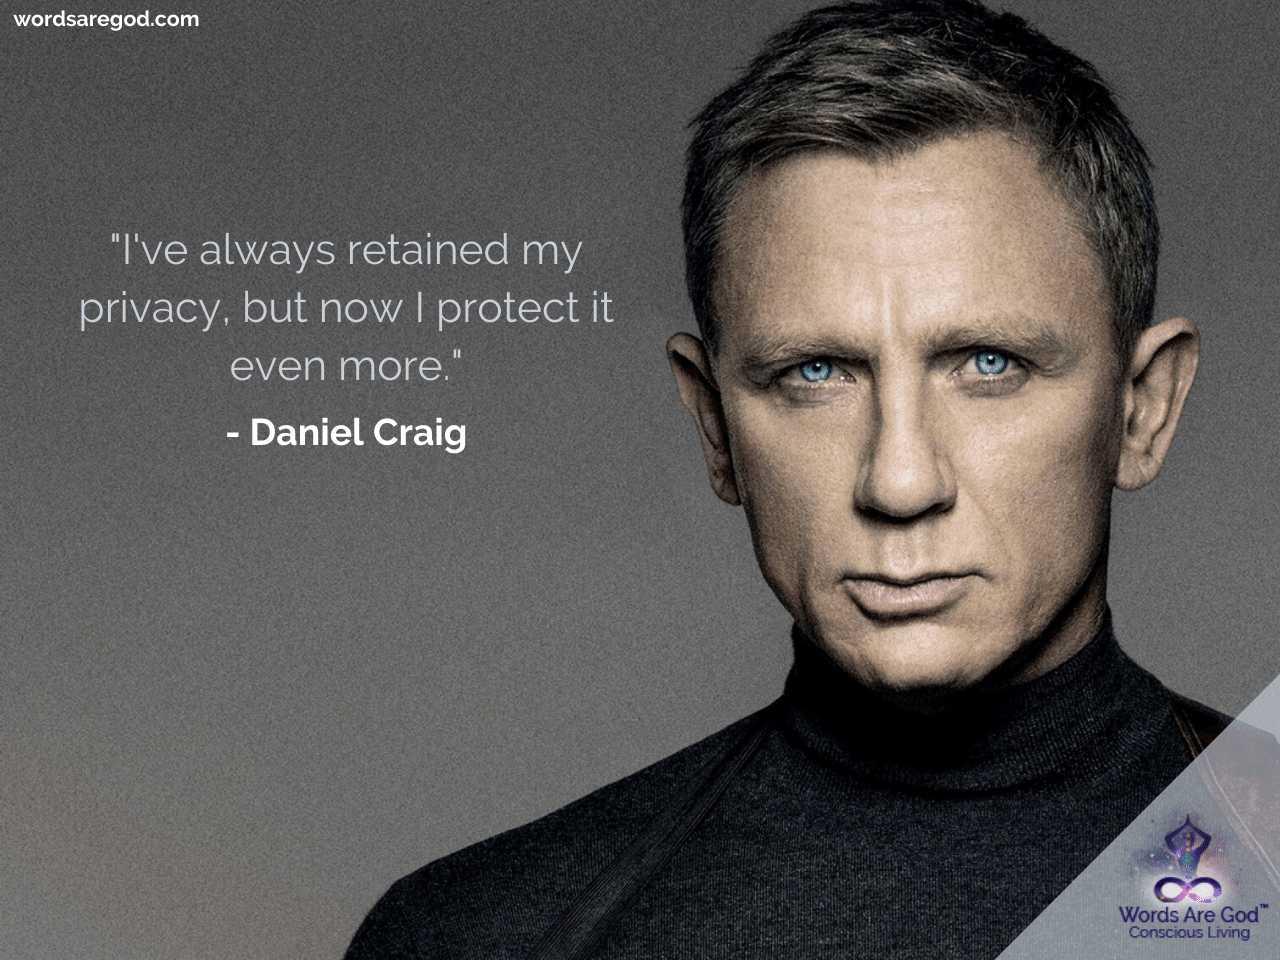 Daniel Craig Motivational Quotes